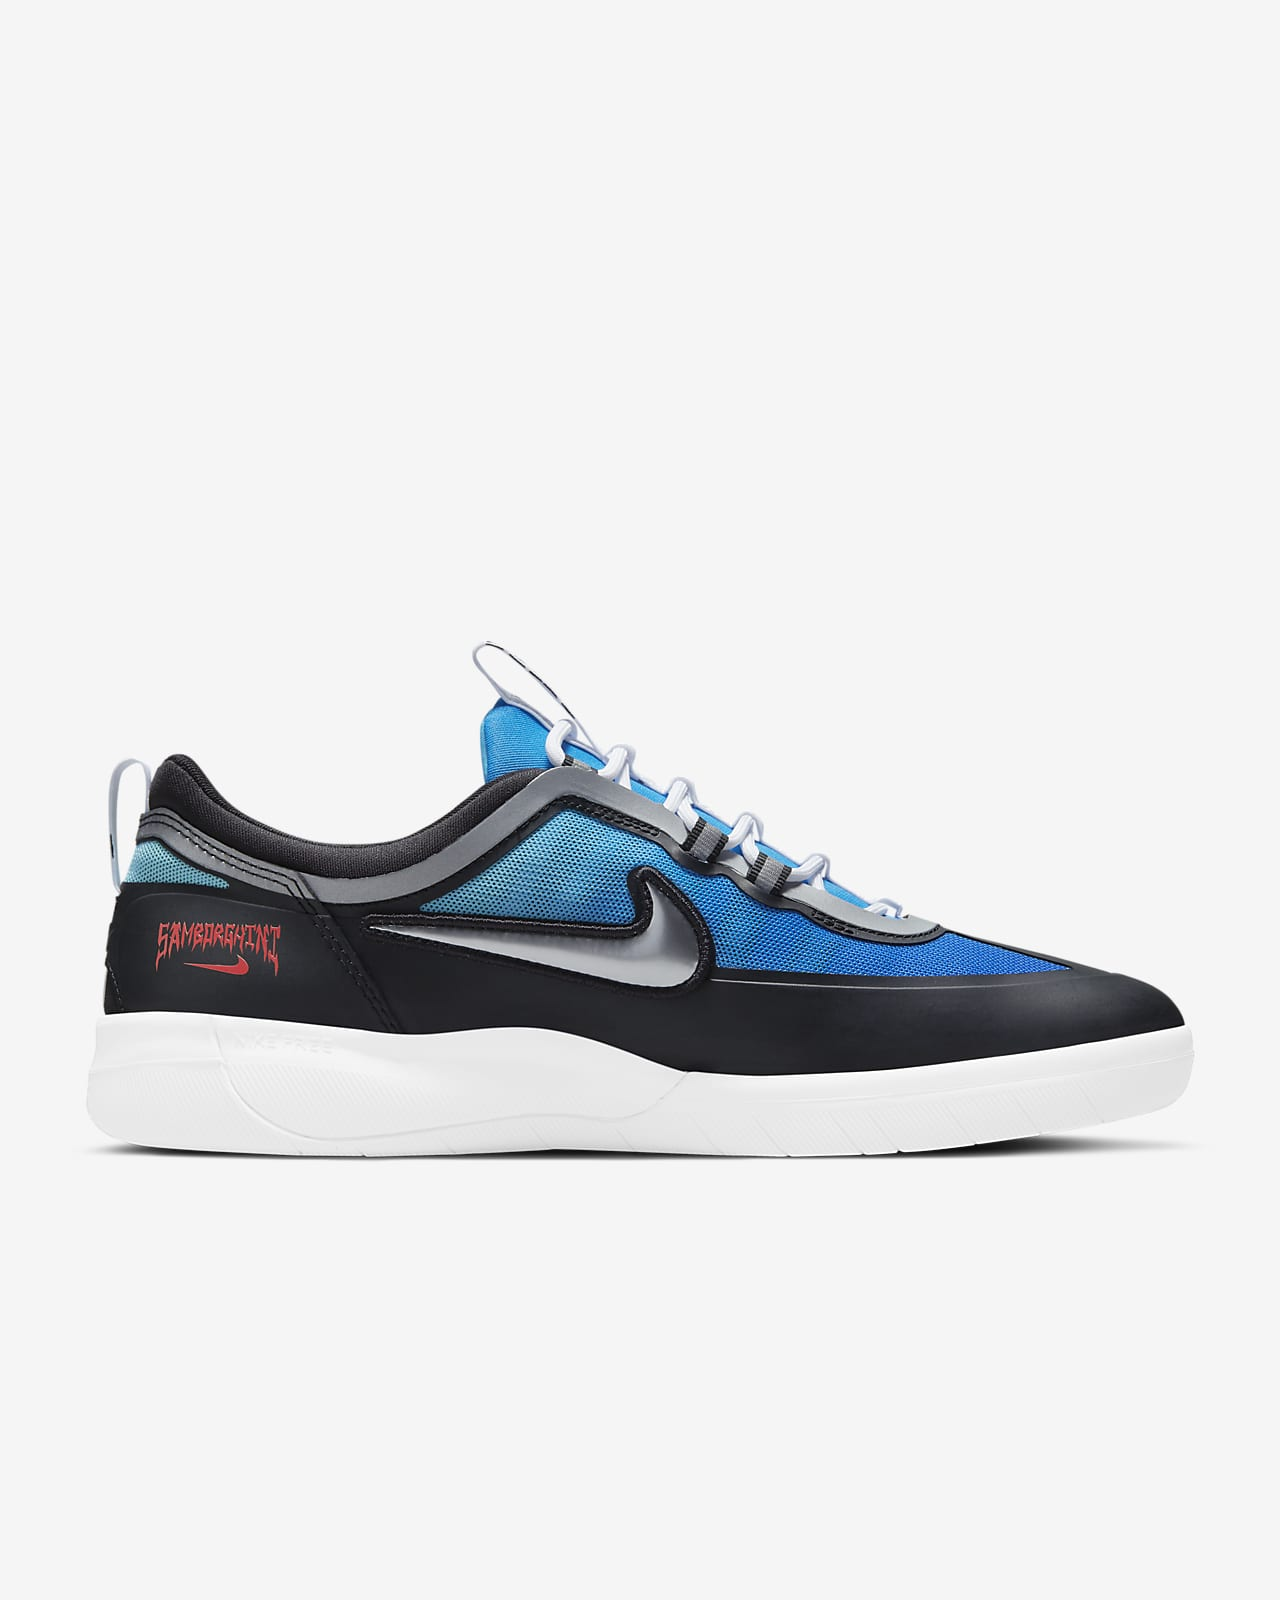 Chaussure de skateboard Nike SB Nyjah Free 2 Premium